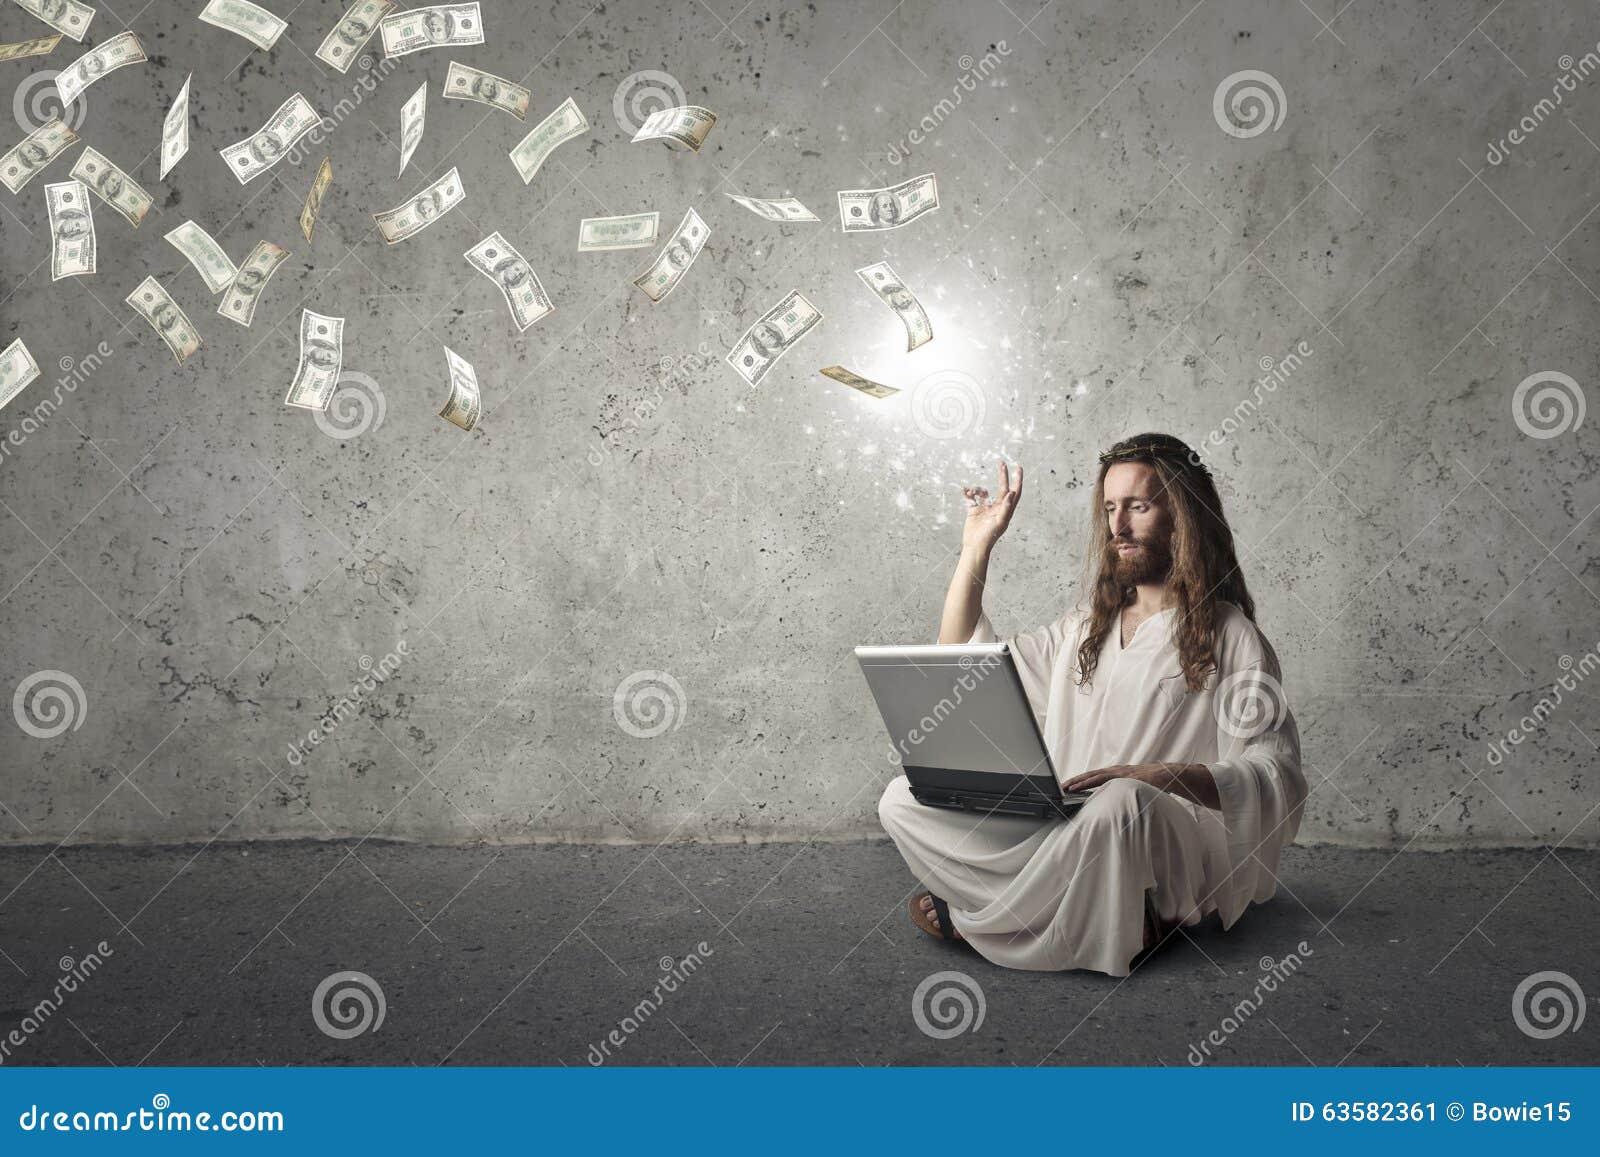 Rich Jesus